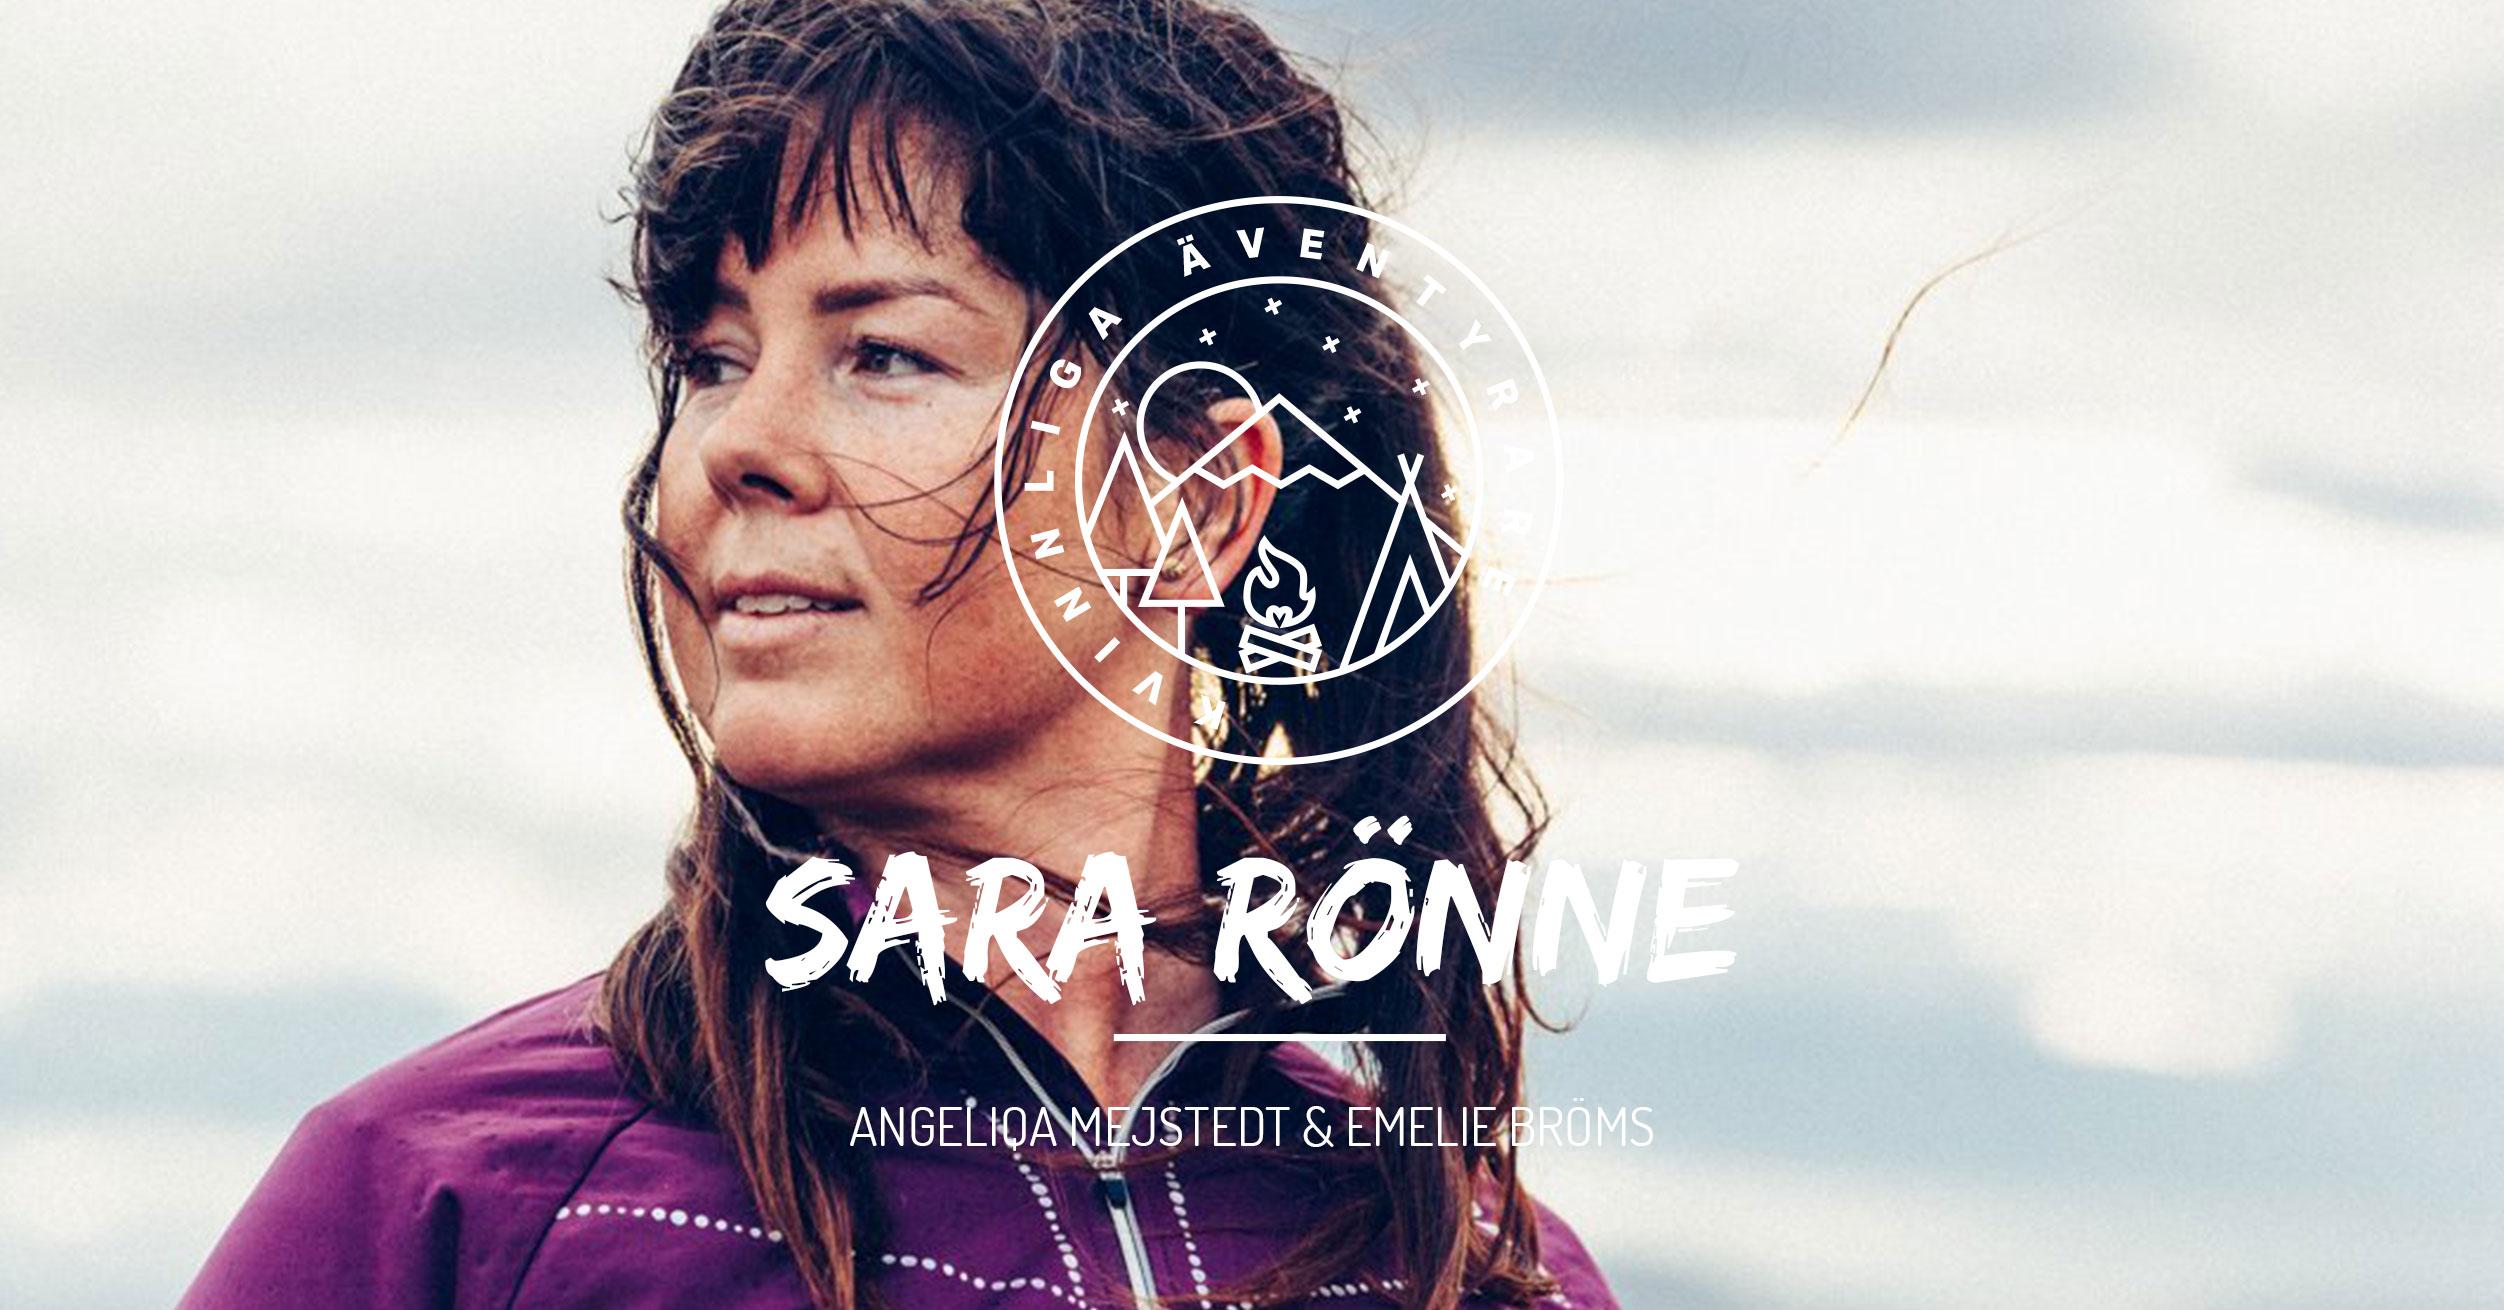 03-Sara Rönne-Kvinnliga-Aventyrare-Podcast-FB